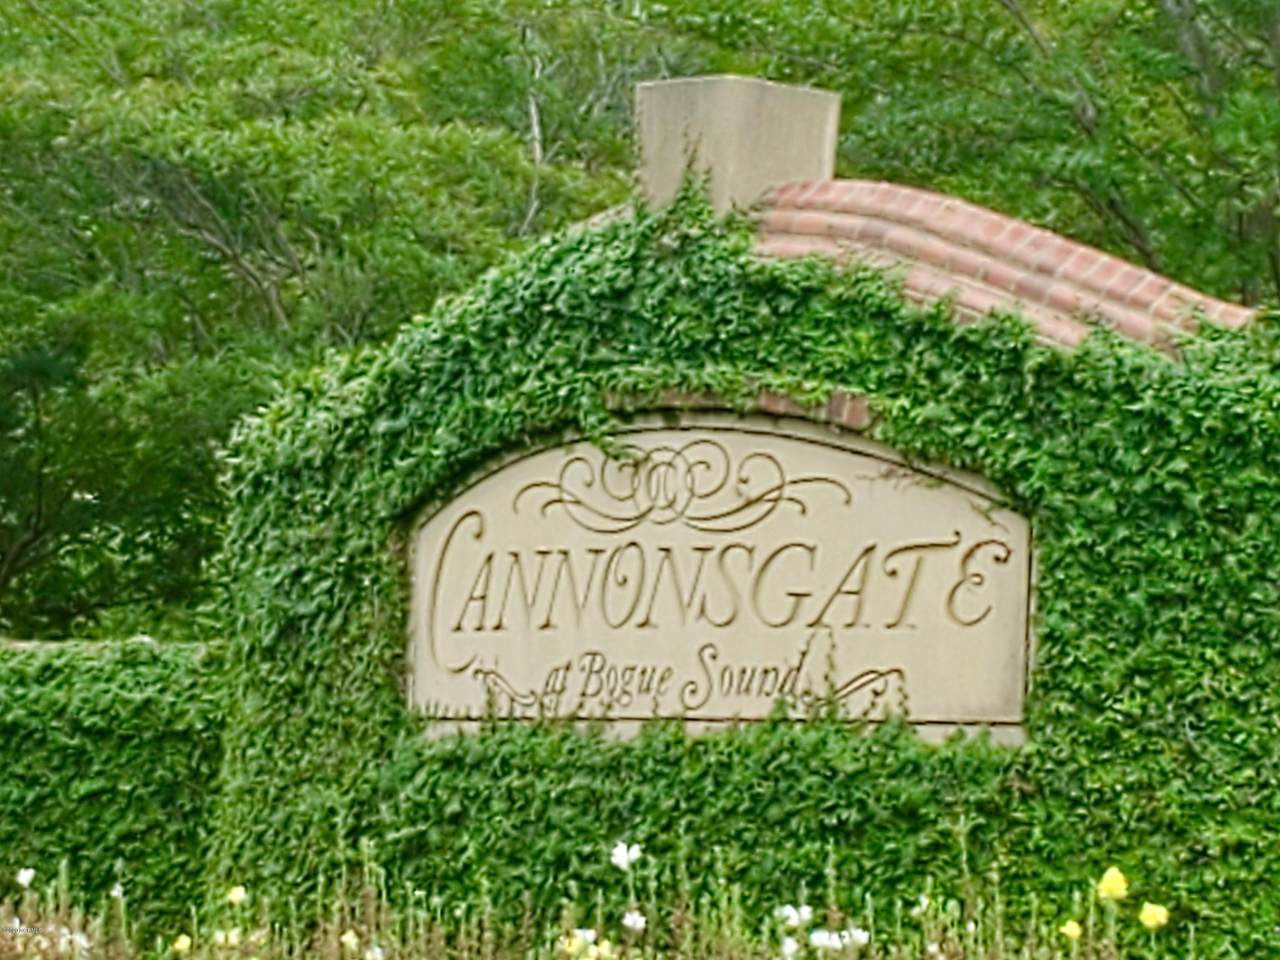 730 Cannonsgate Drive - Photo 1